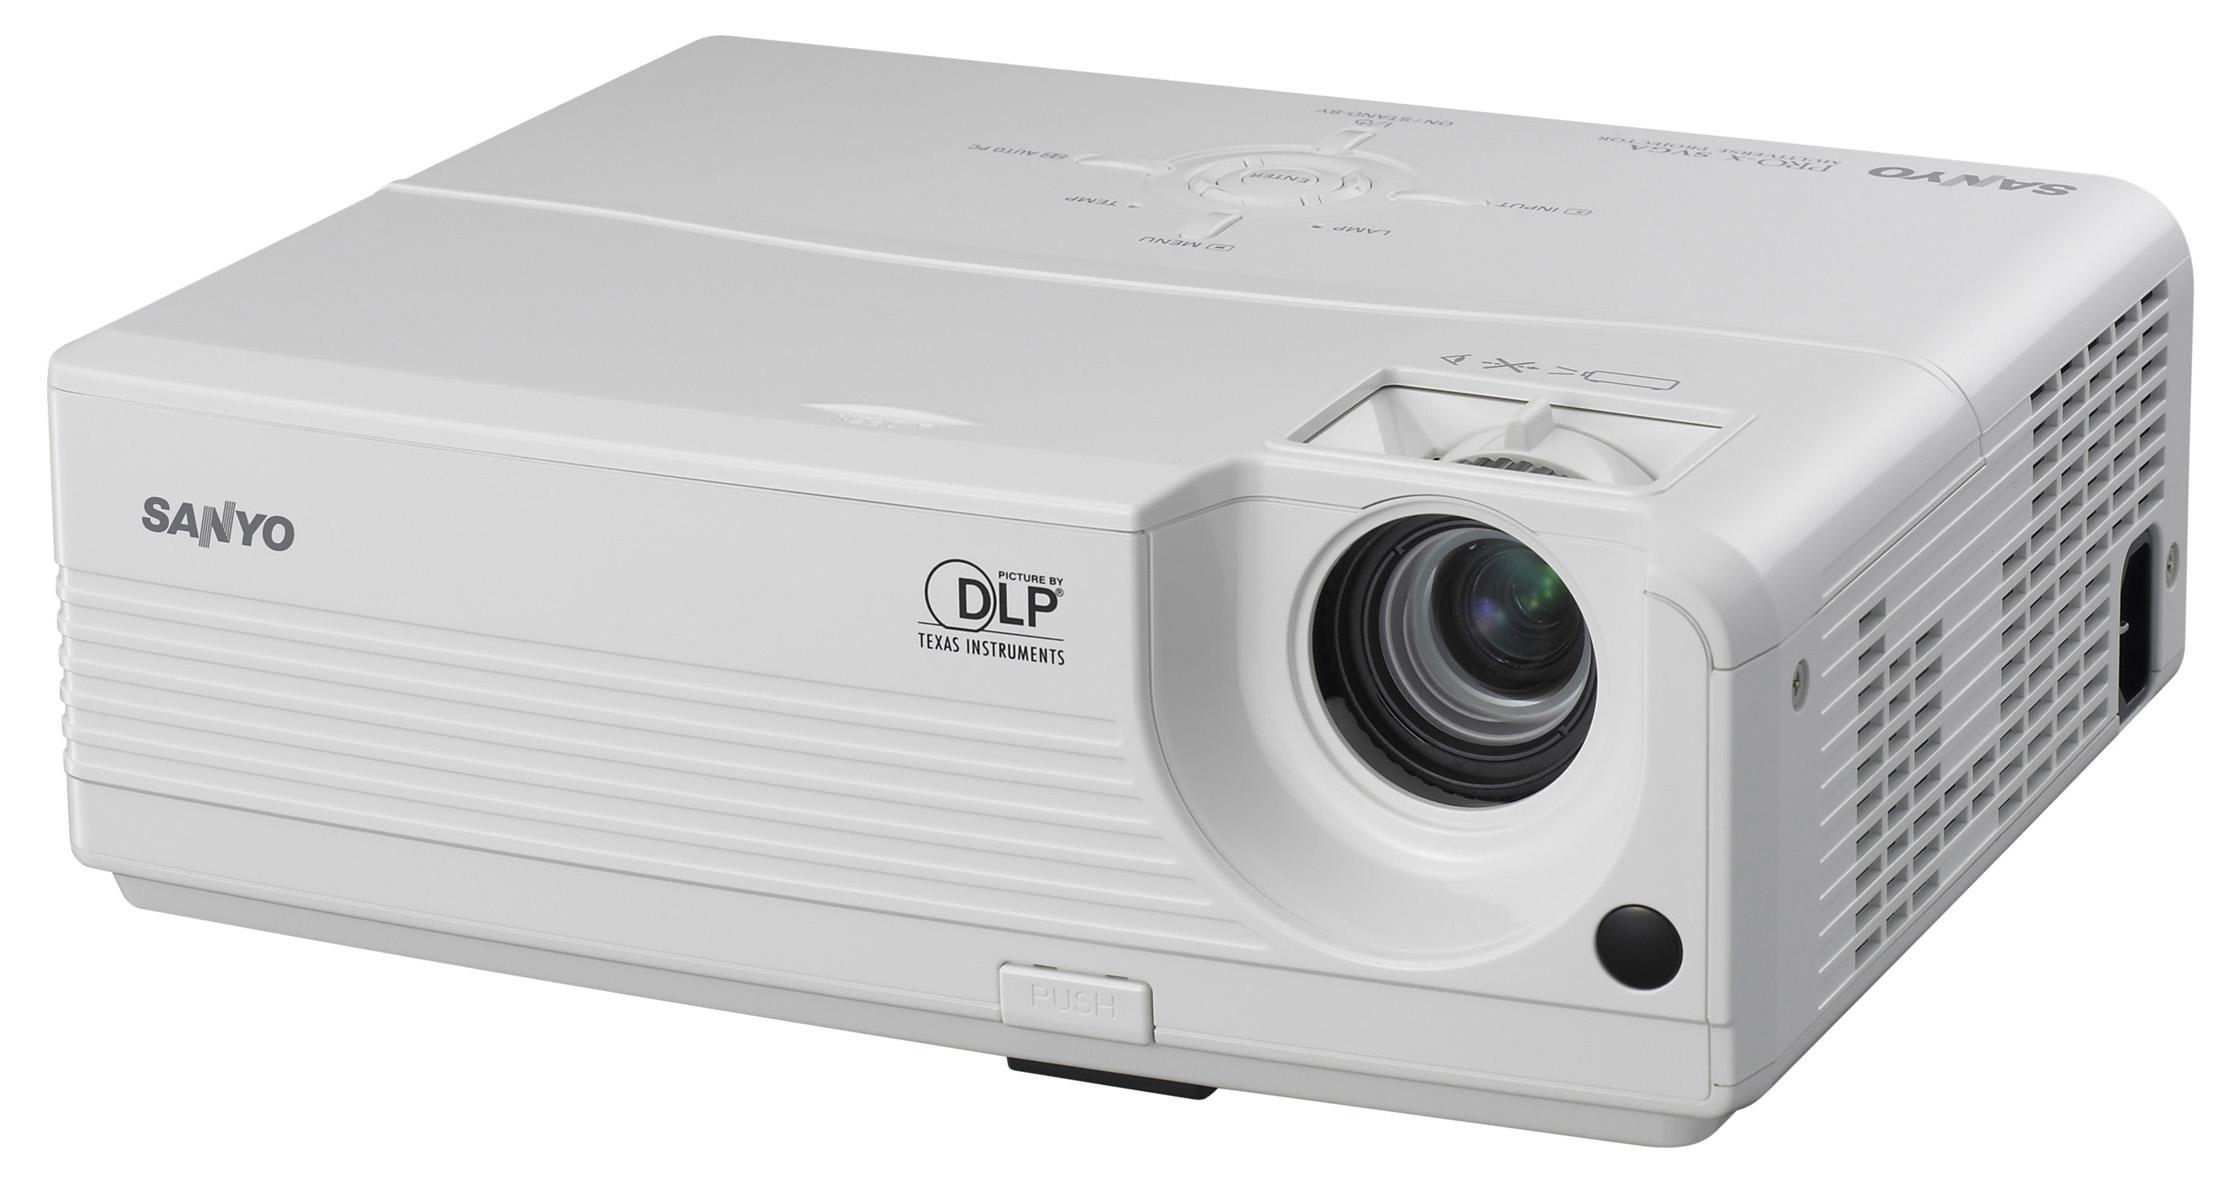 Beste Sanyo Projektoren: Sanyo PDG DSU21/N SVGA DLP Beamer WG-19